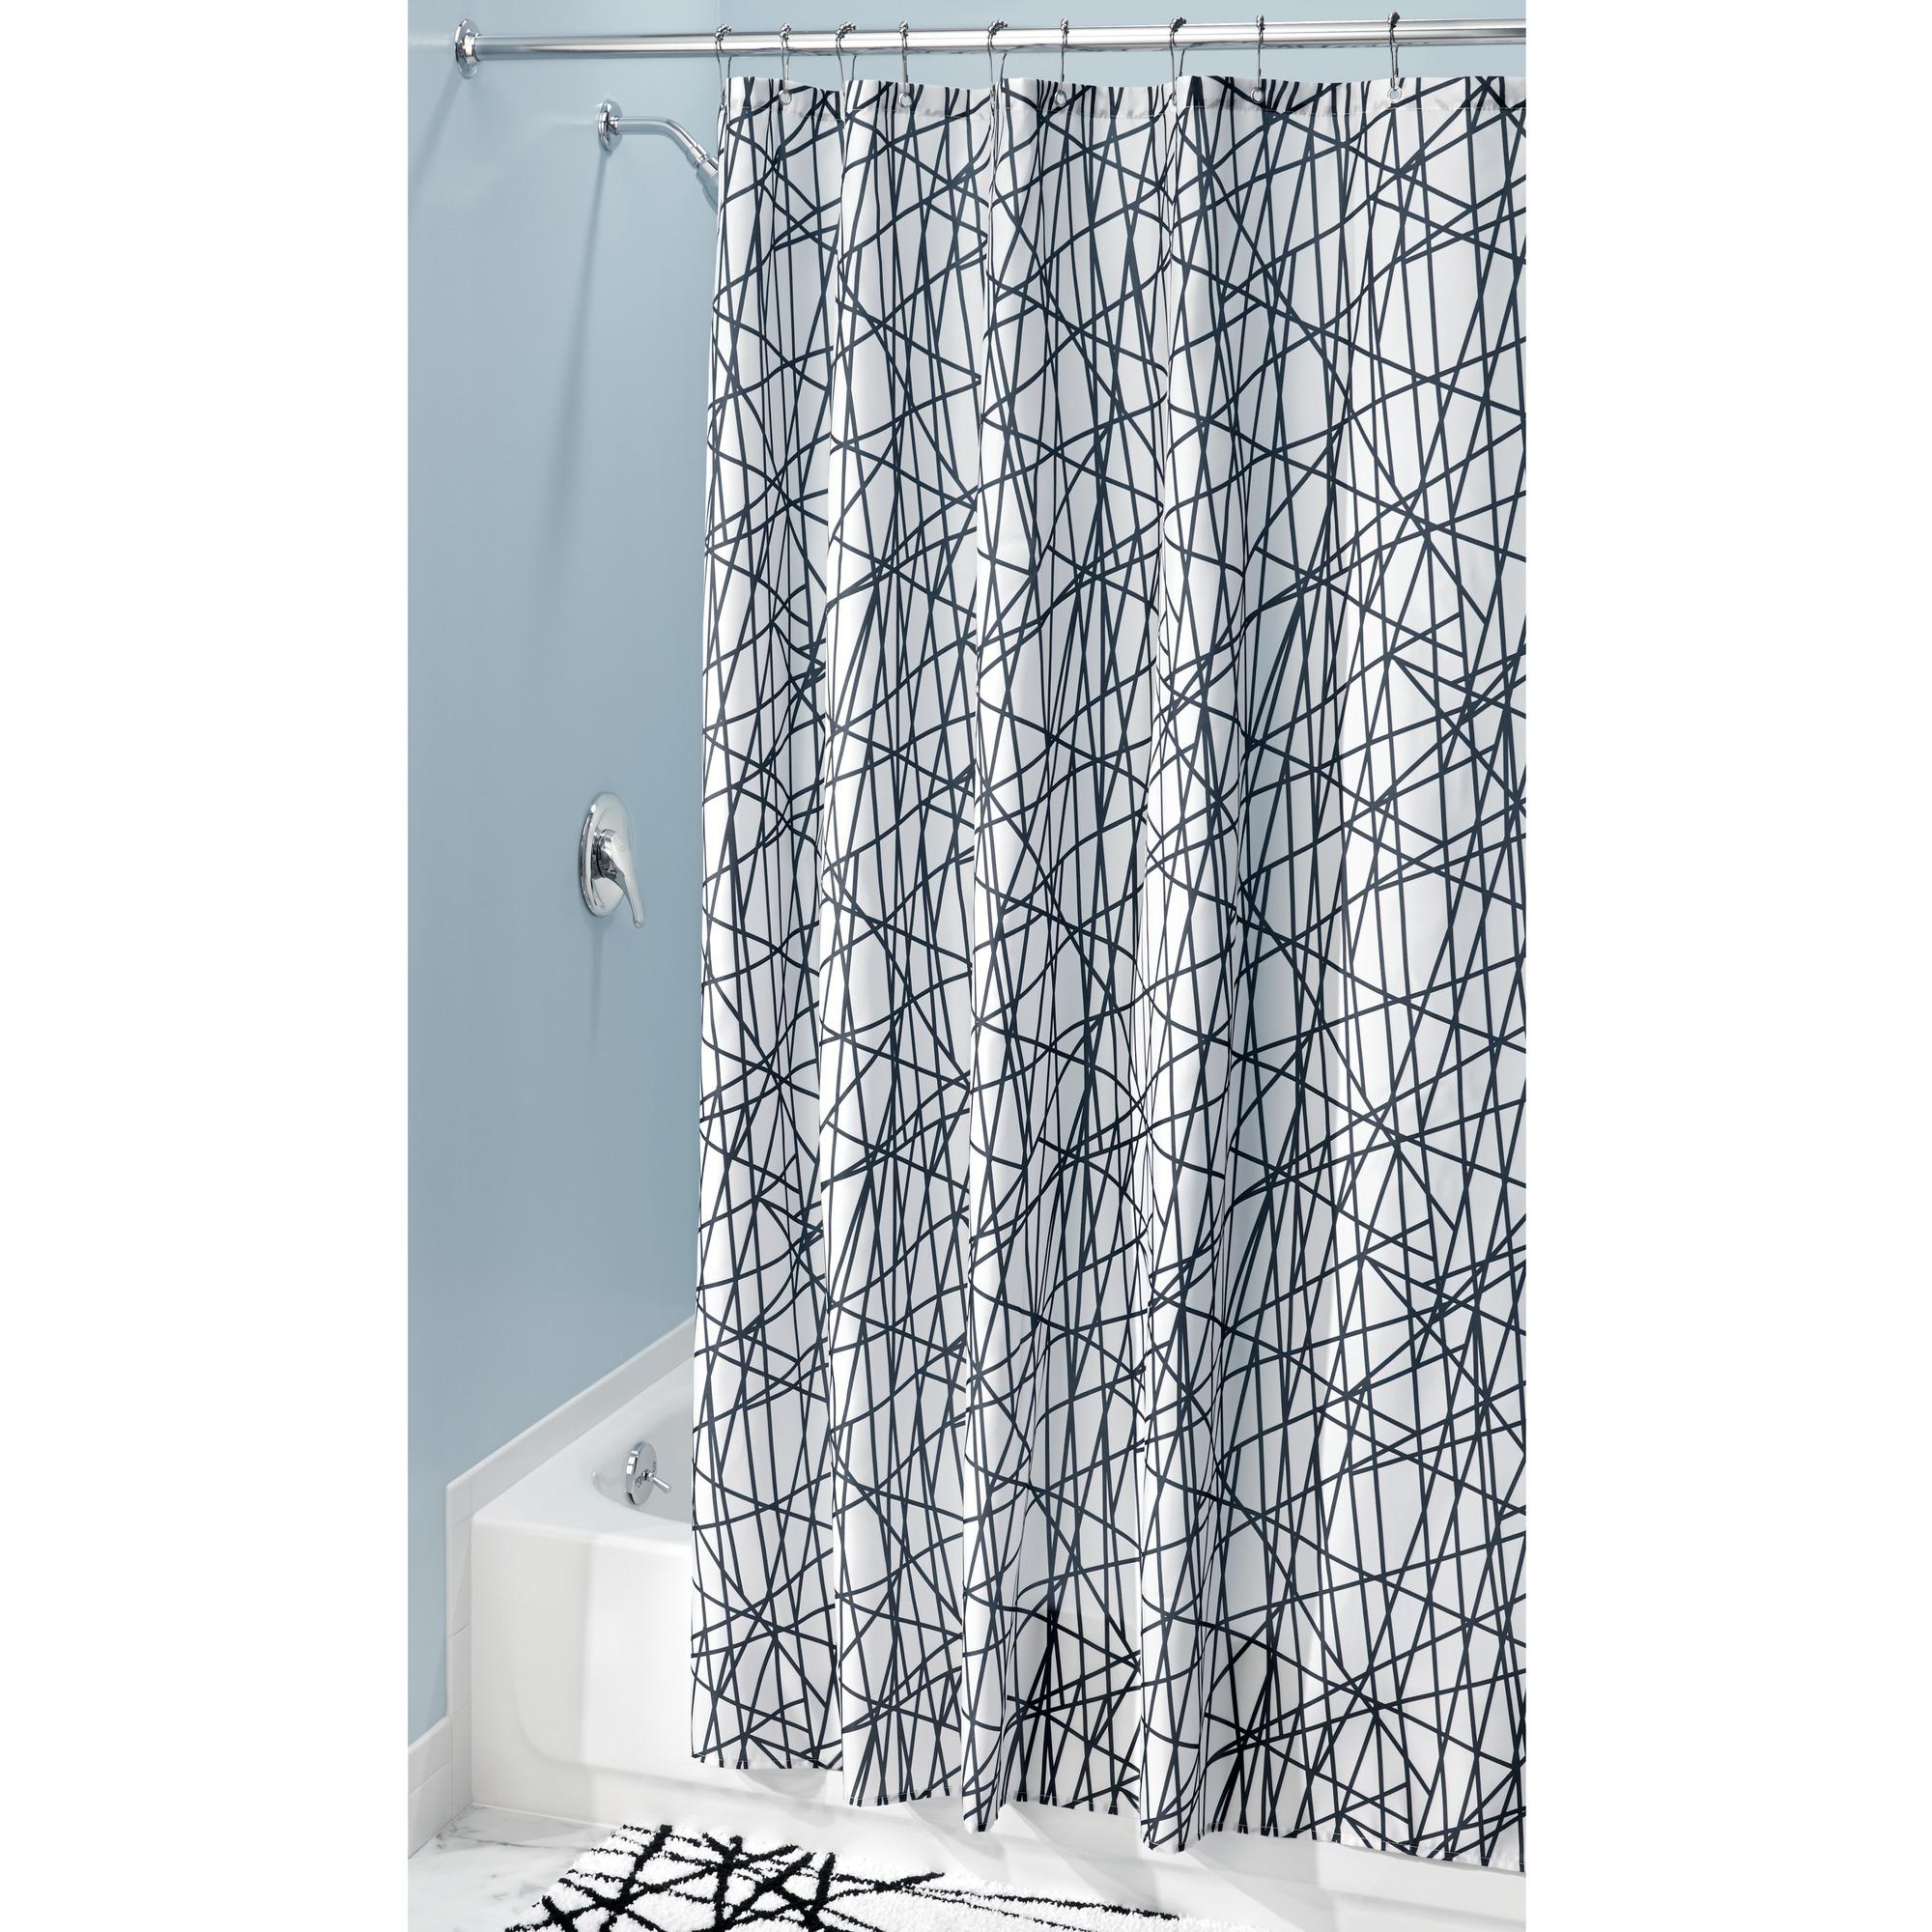 "InterDesign Abstract Fabric Shower Curtain, Standard 72"" x 72"", Black/White"